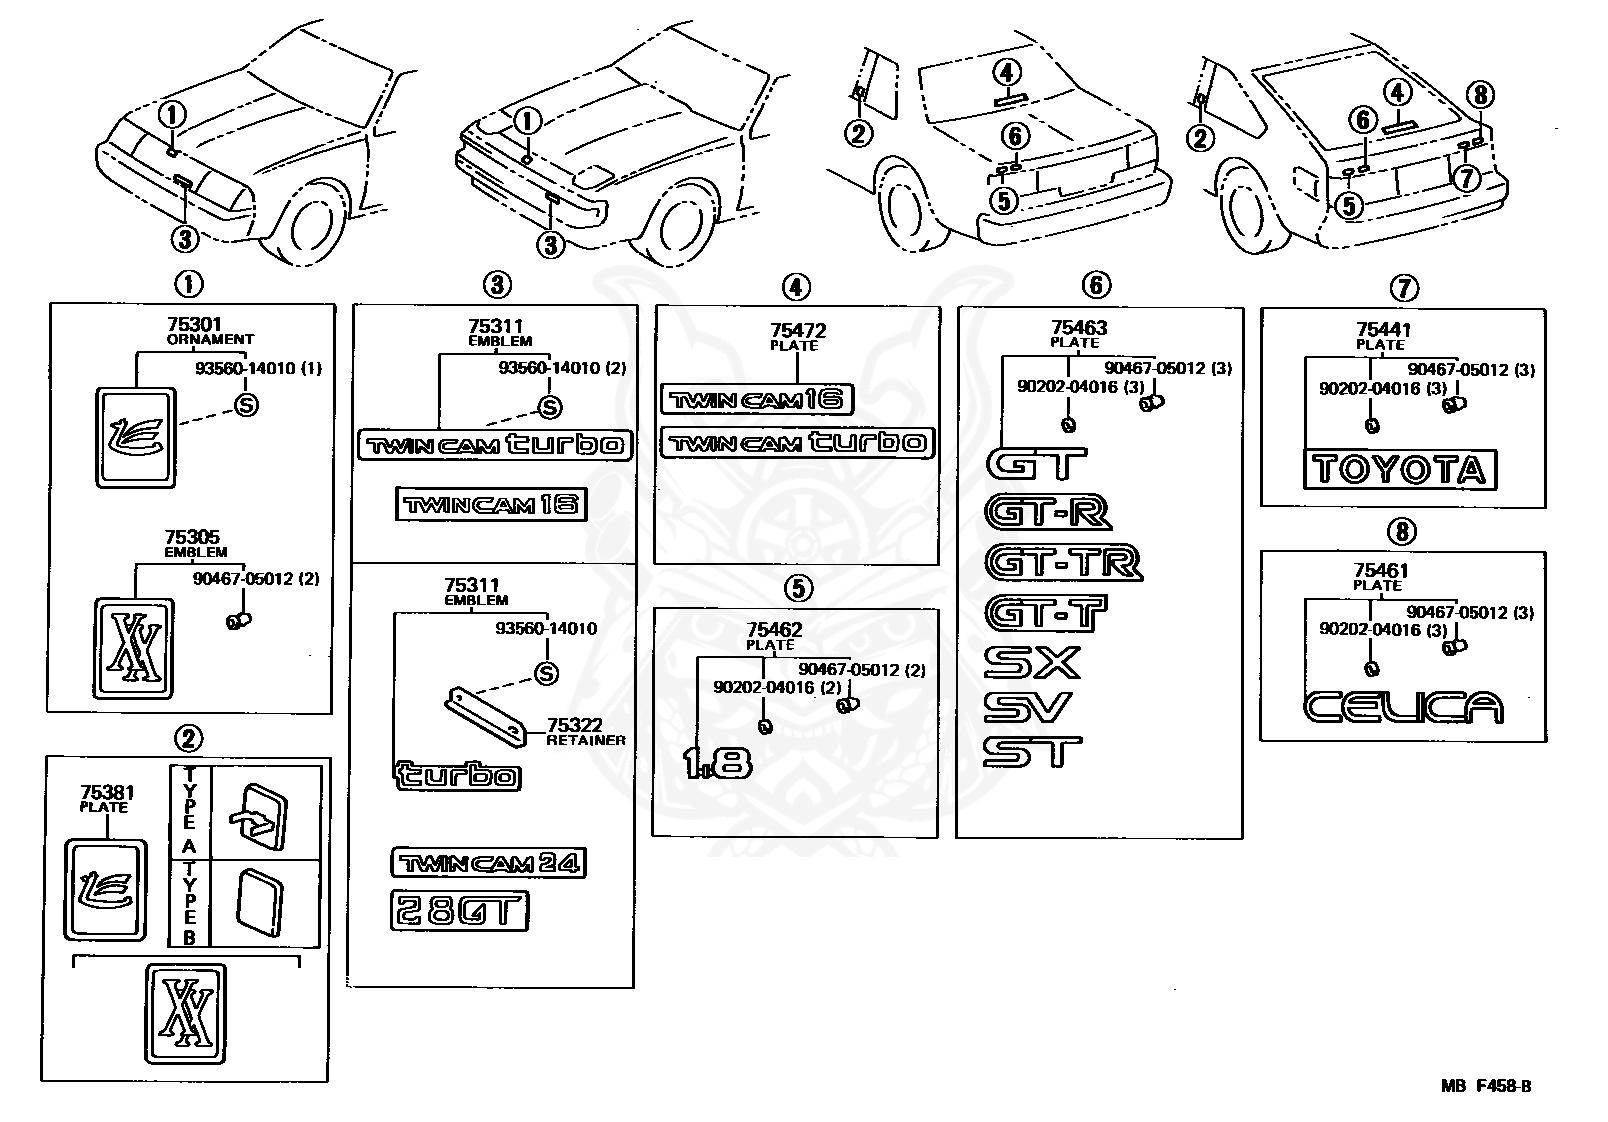 toyota 1 8 diagram 75321 19685 toyota emblem  radiator grille  or front panel  75321 19685 toyota emblem  radiator